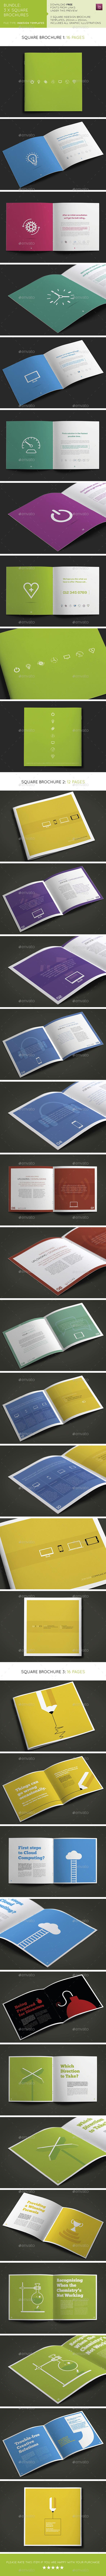 GraphicRiver Square Brochure Bundle 11066769